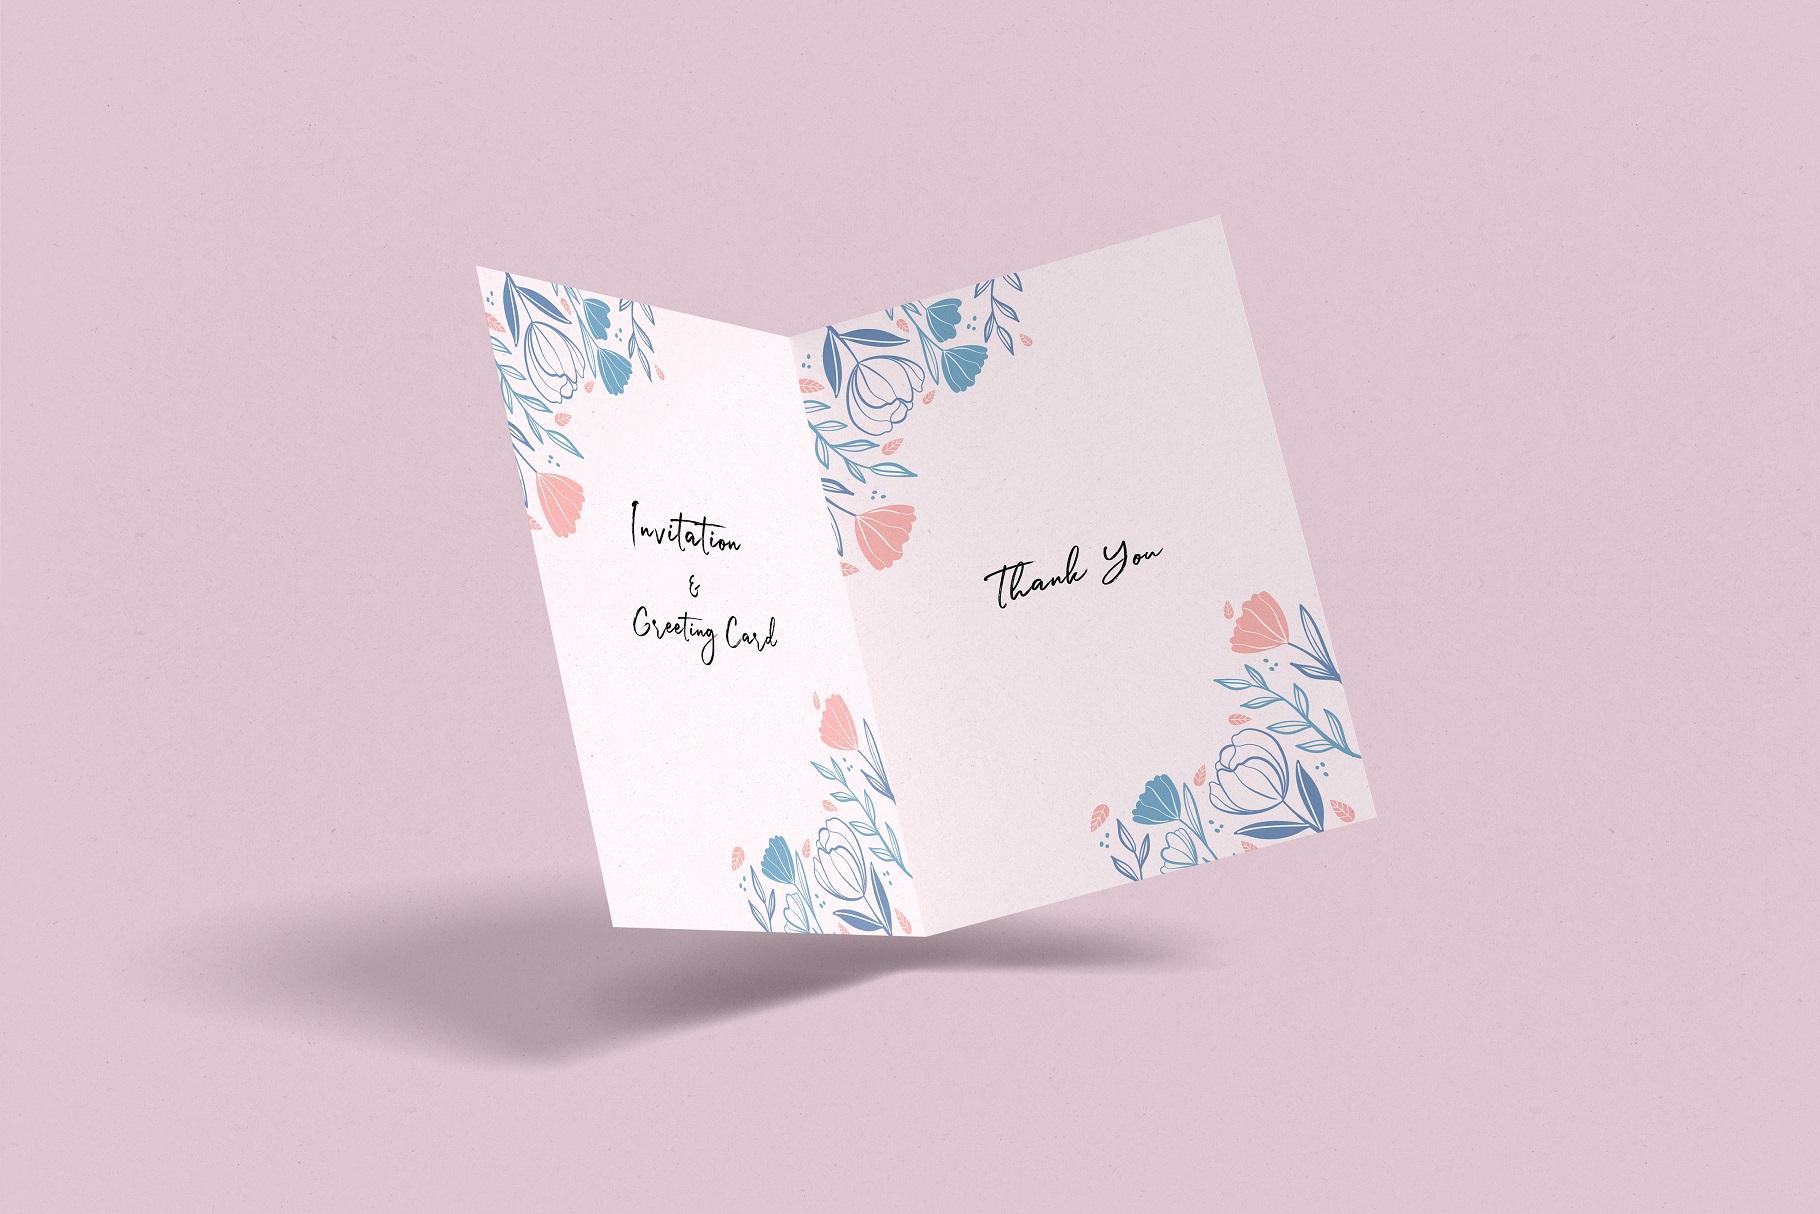 Invitation & Greeting Card Mockup example image 5